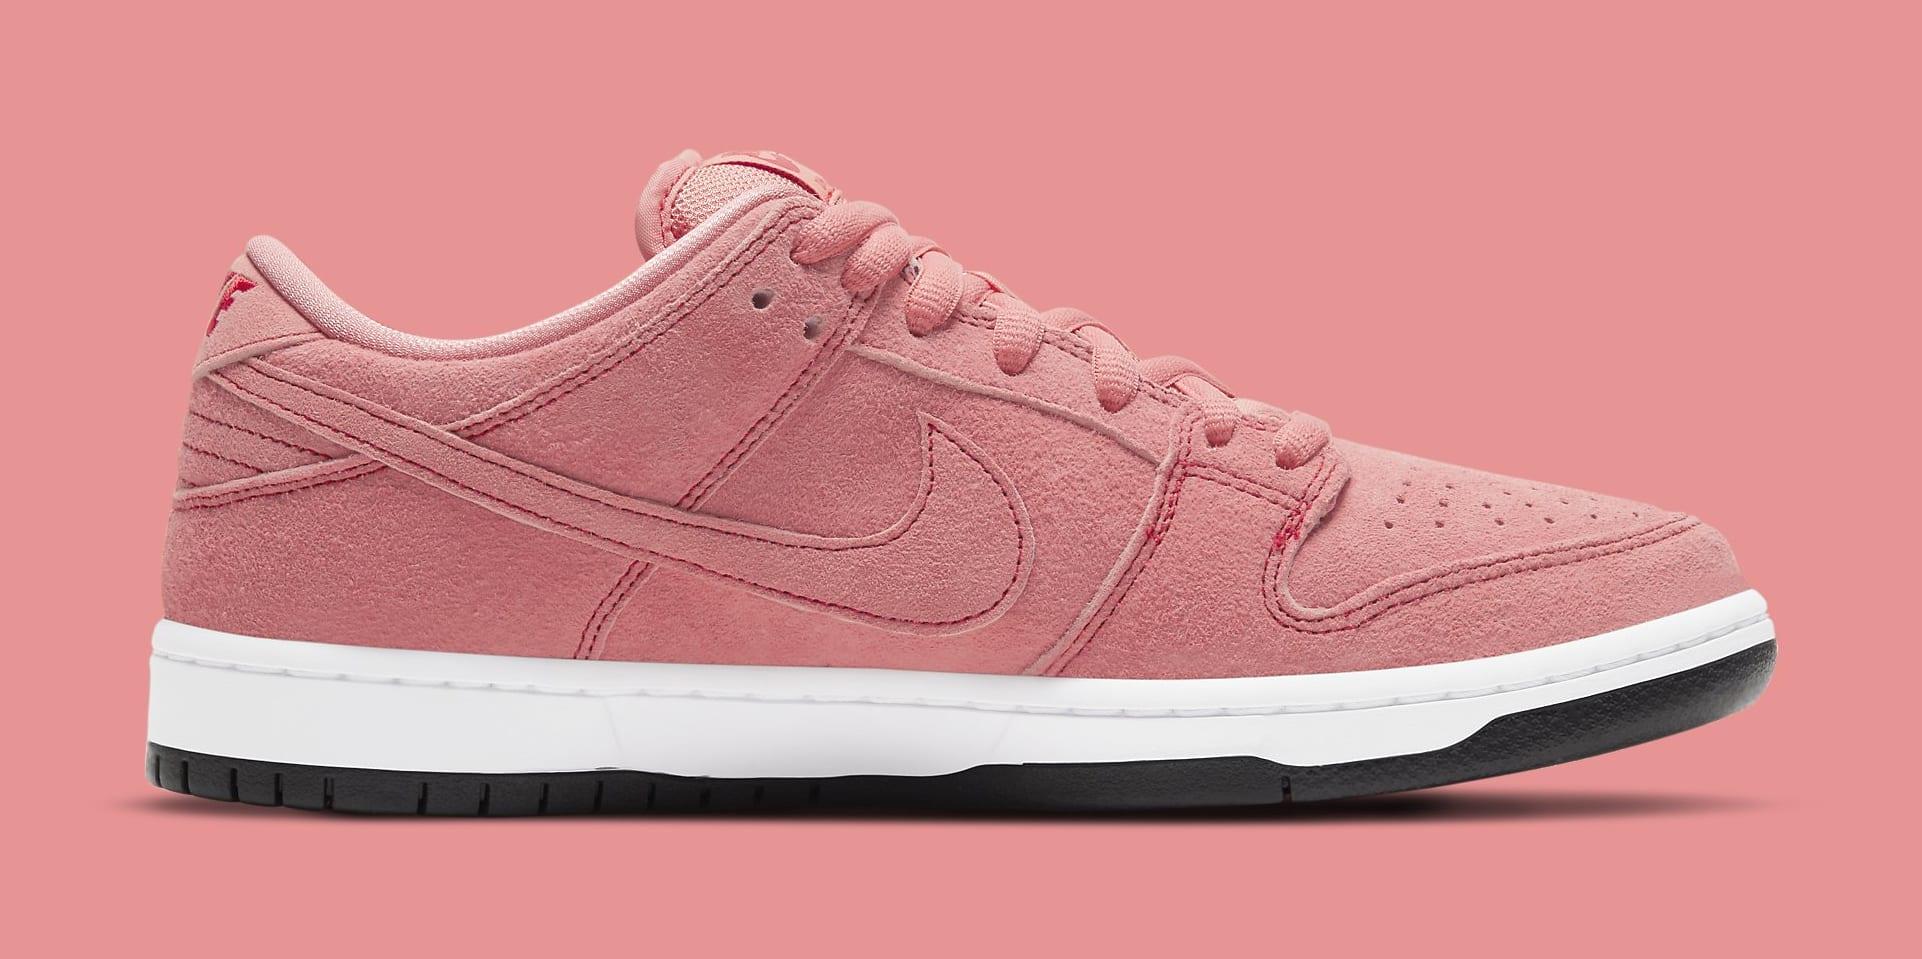 Nike SB Dunk Low 'Pink Pig' CV1655-600 Medial